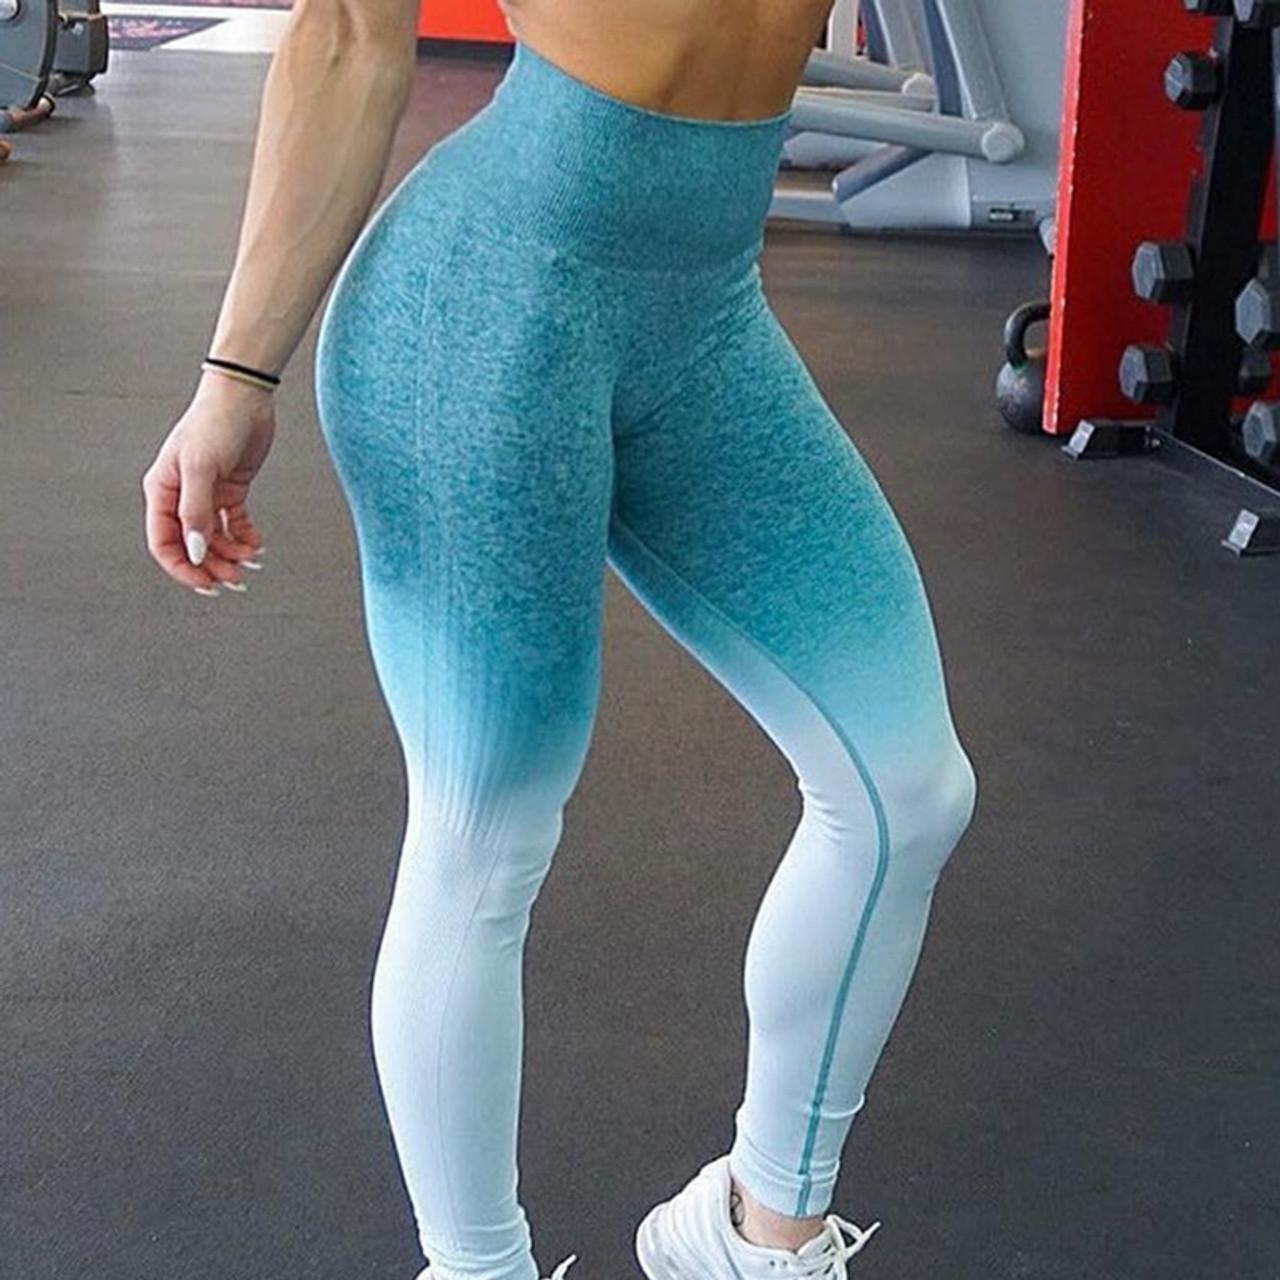 403dd54944dc52 Zhangyunuo Push Up Yoga Leggings Compression Tights Slim Ombre Seamless Gym  Leggings Sport Fitness Tummy Control ...